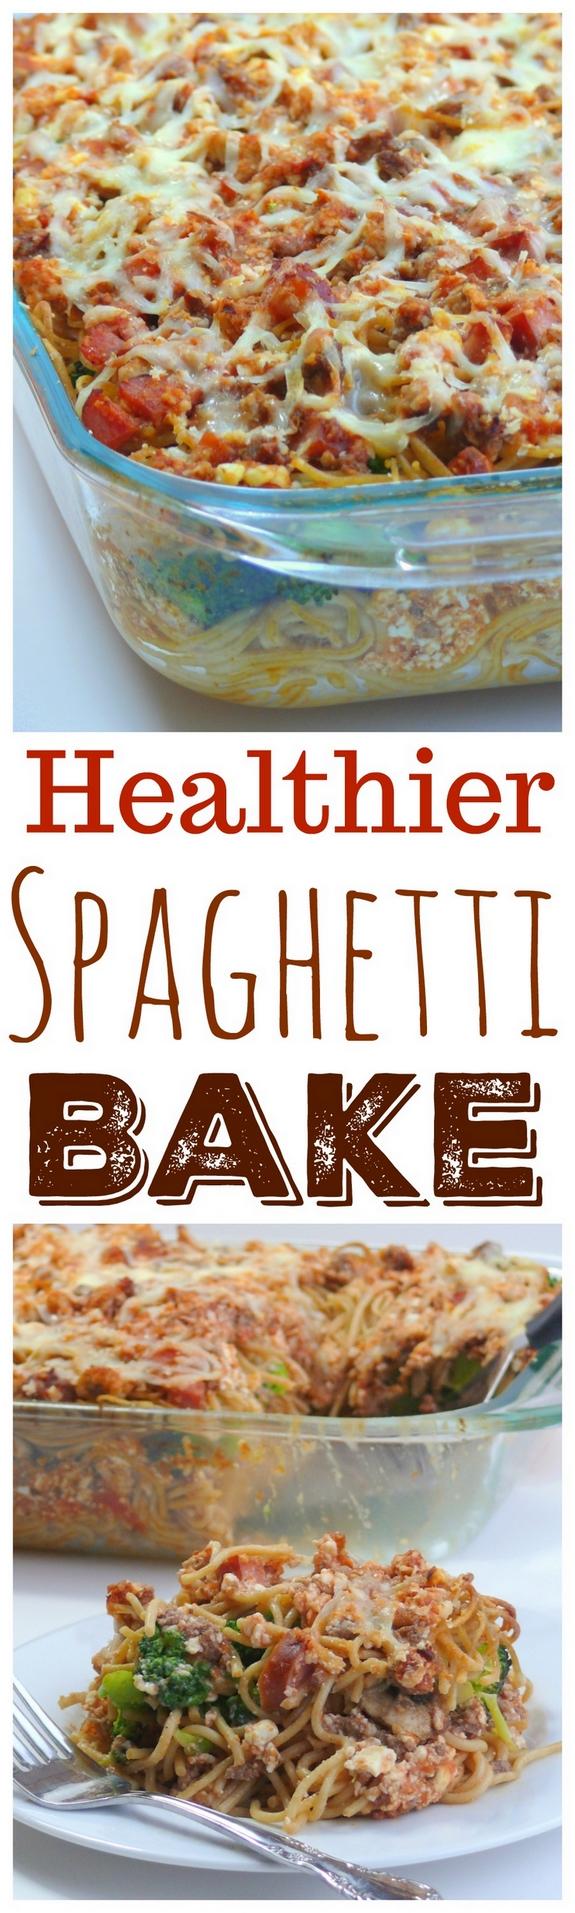 Healthier Spaghetti Bake from NoblePig.com